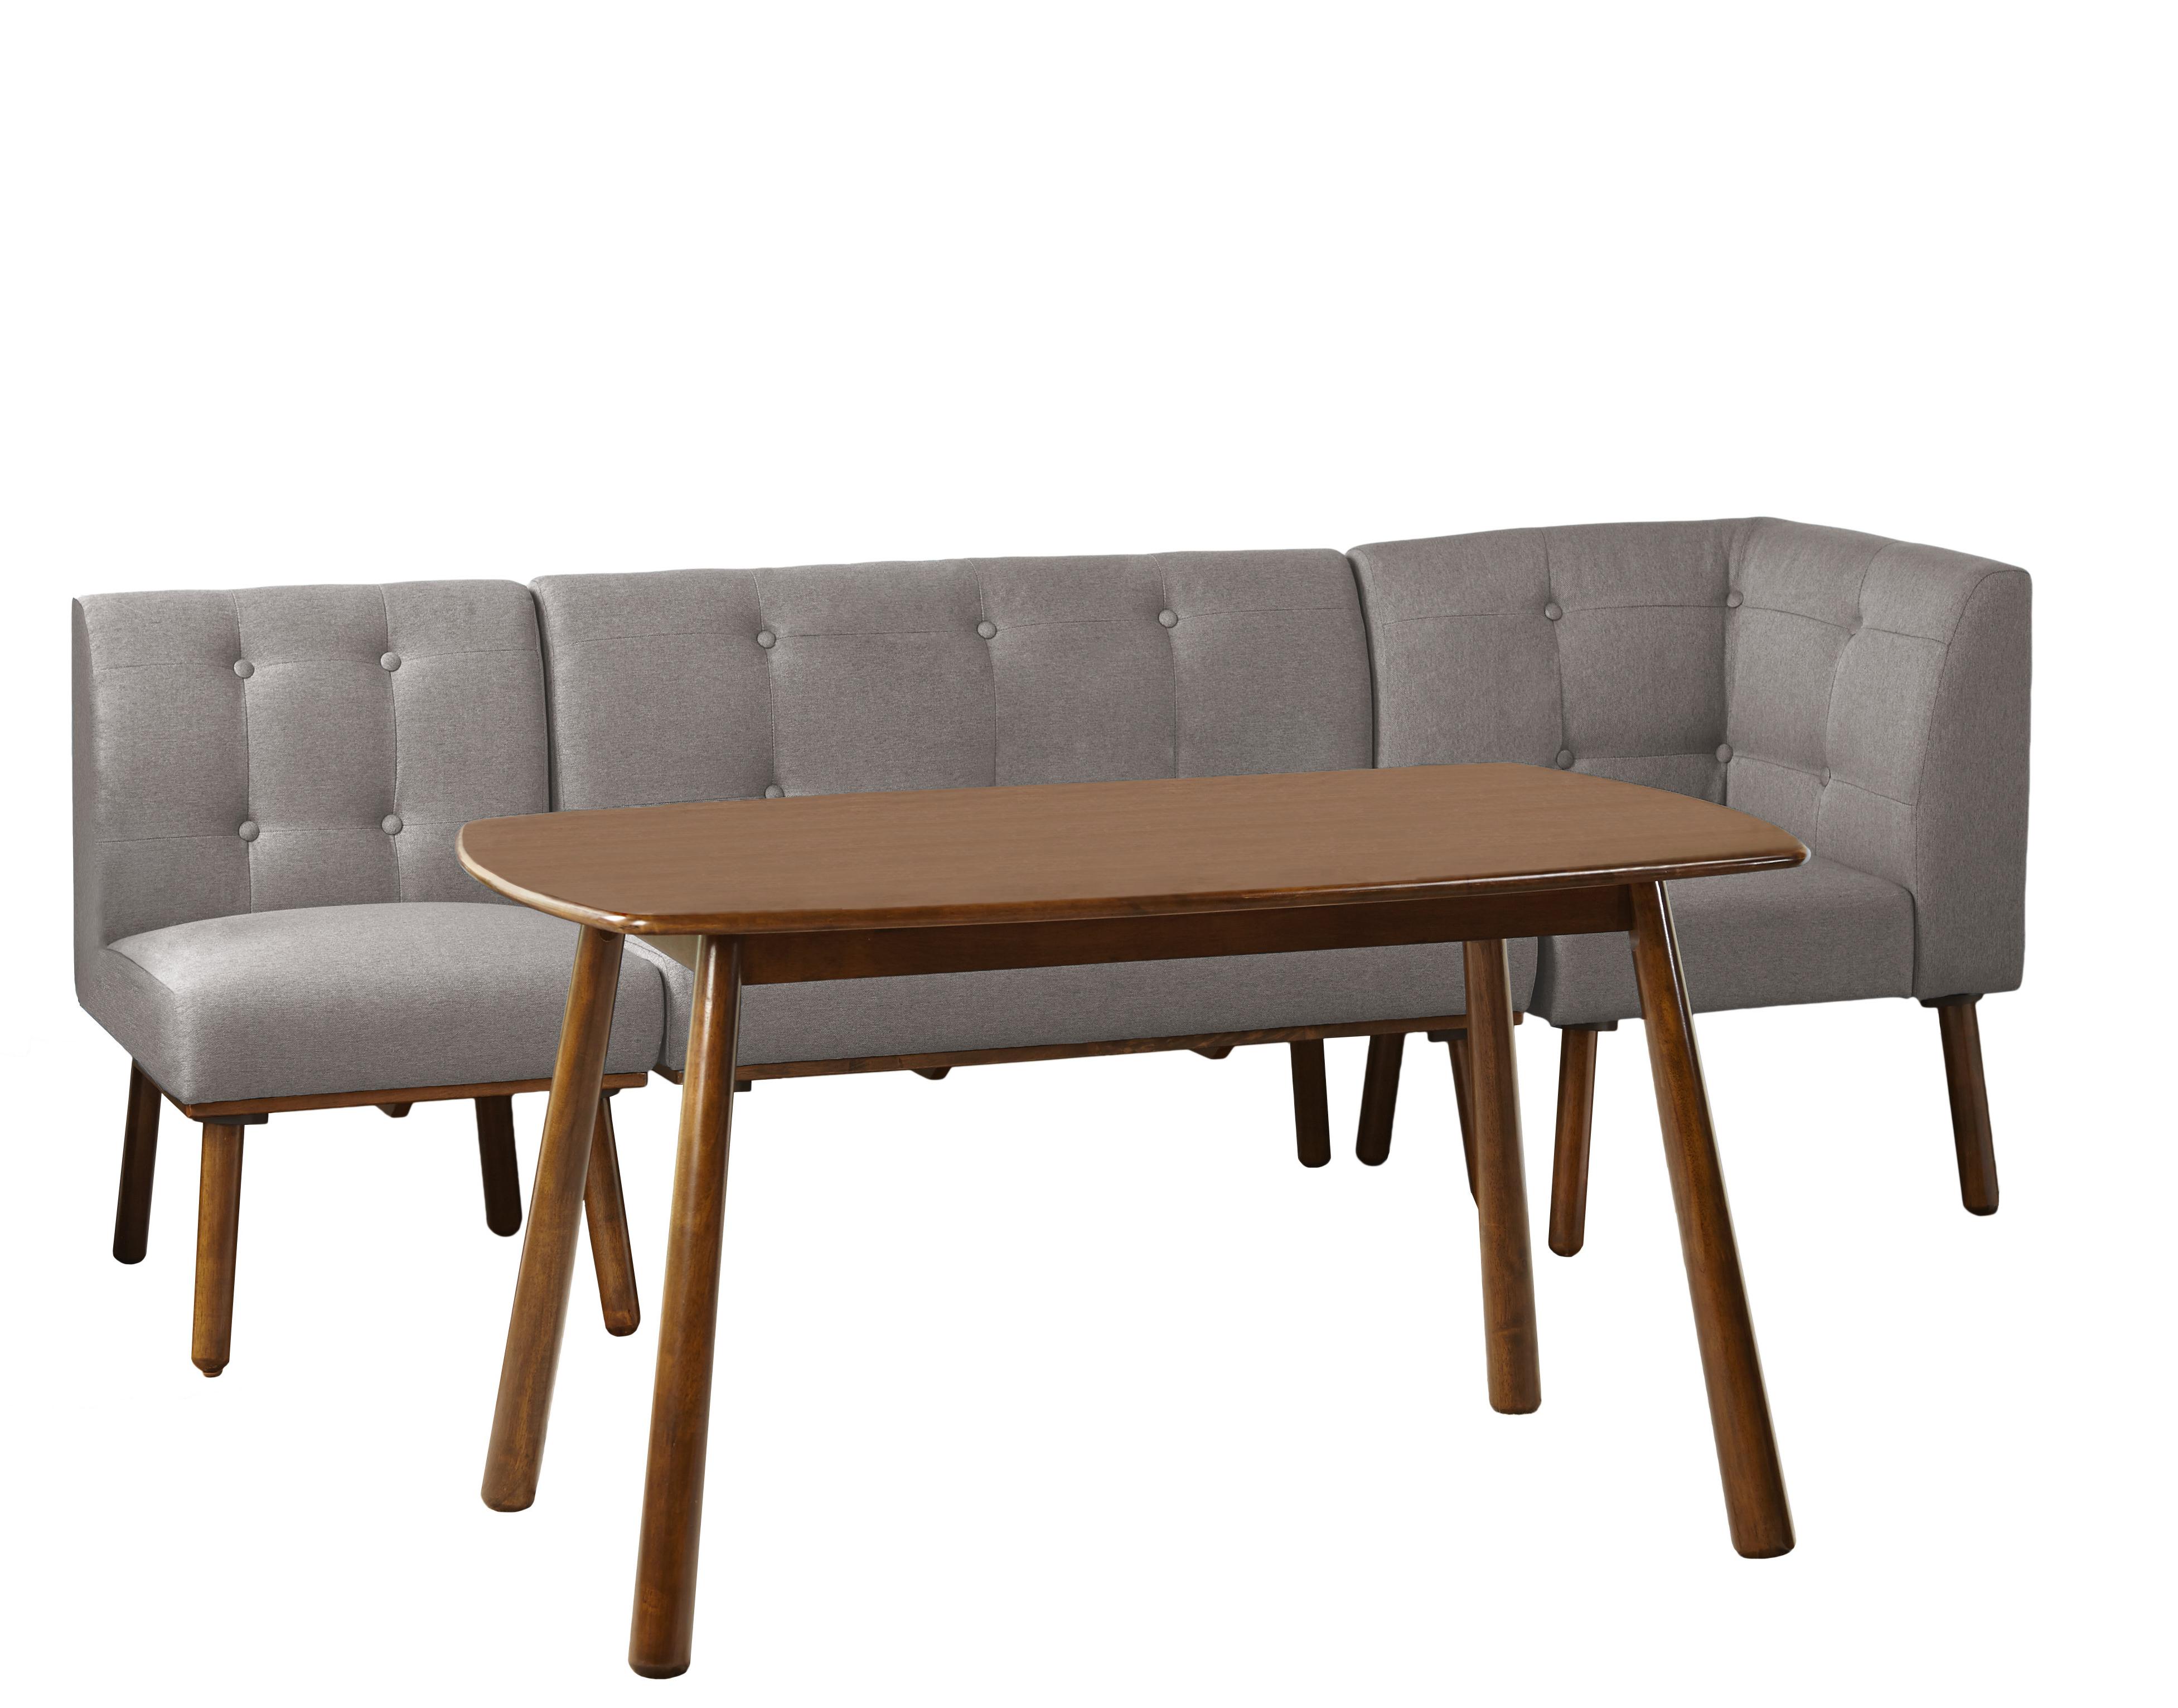 Most Popular Lillard 3 Piece Breakfast Nook Dining Sets With Bucci 4 Piece Breakfast Nook Dining Set (View 15 of 25)